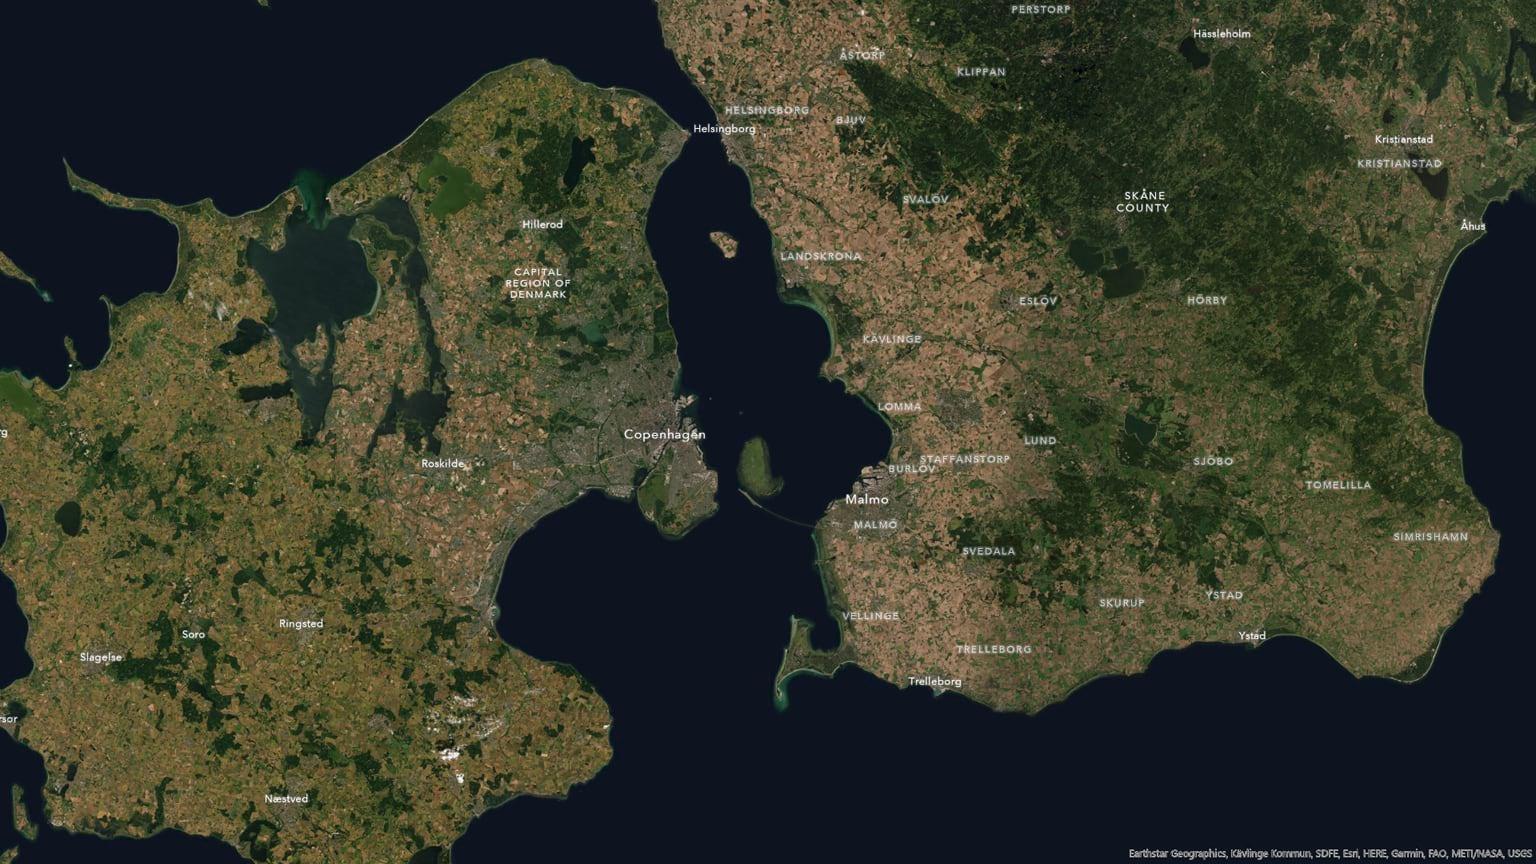 Copenhagen without terrain.